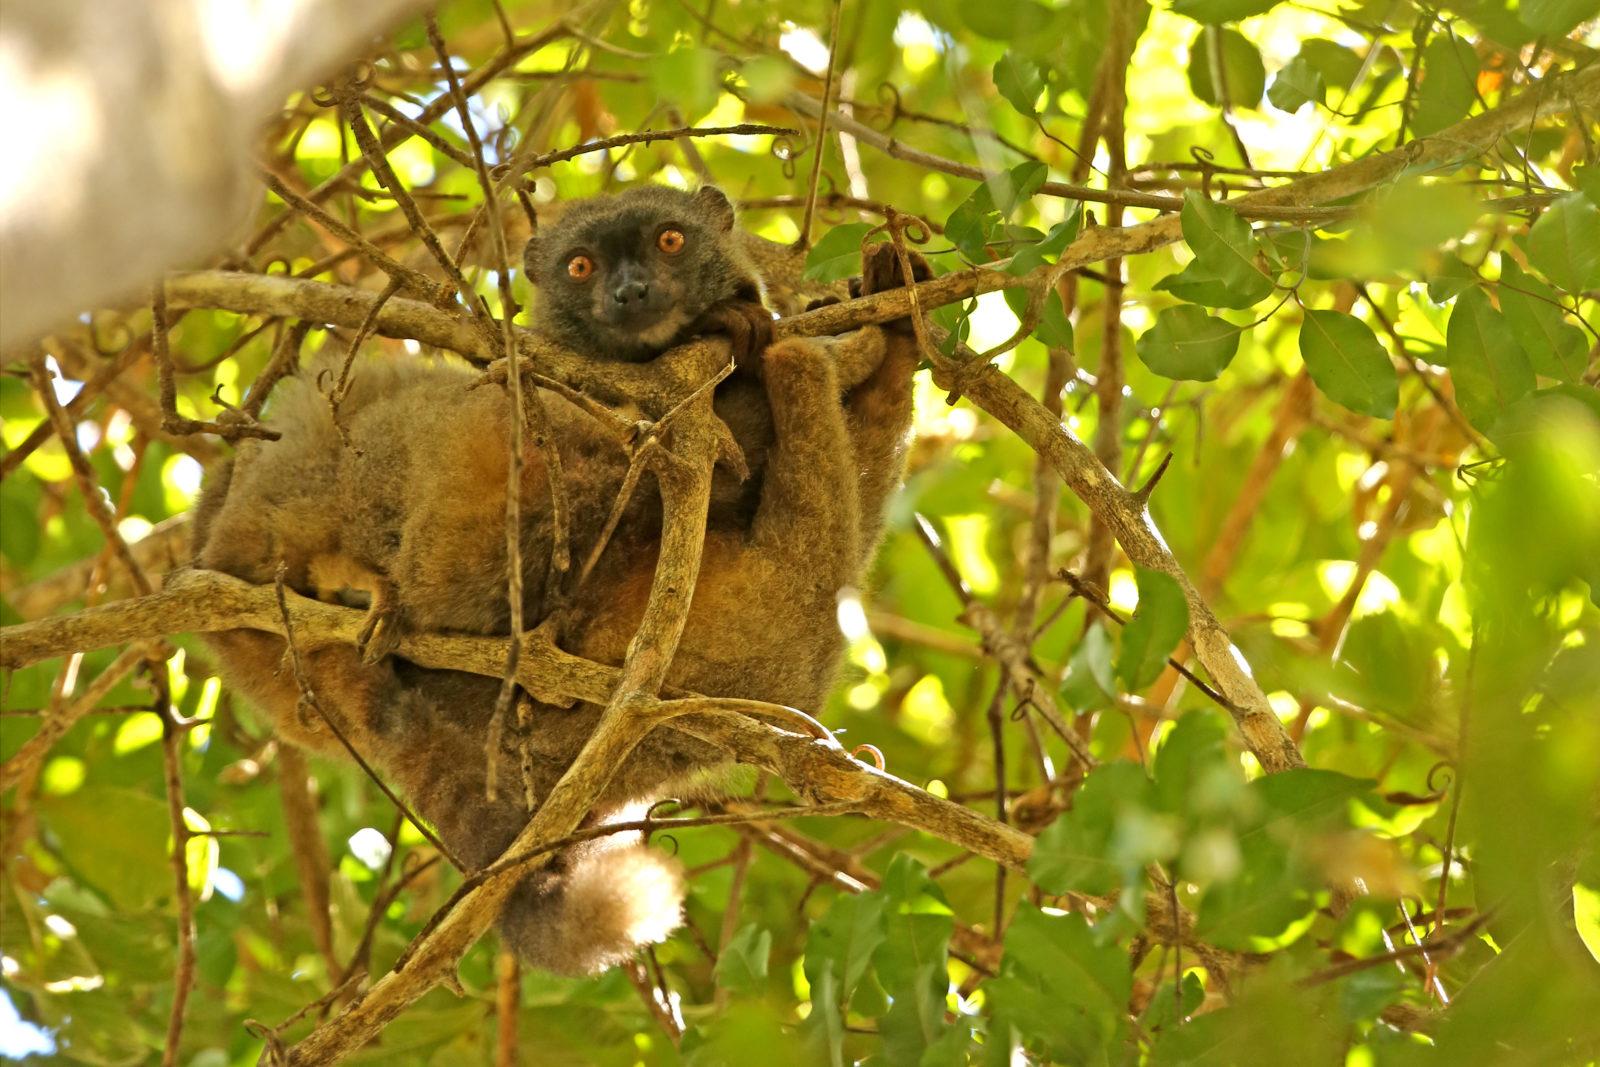 Sandford's brown lemur